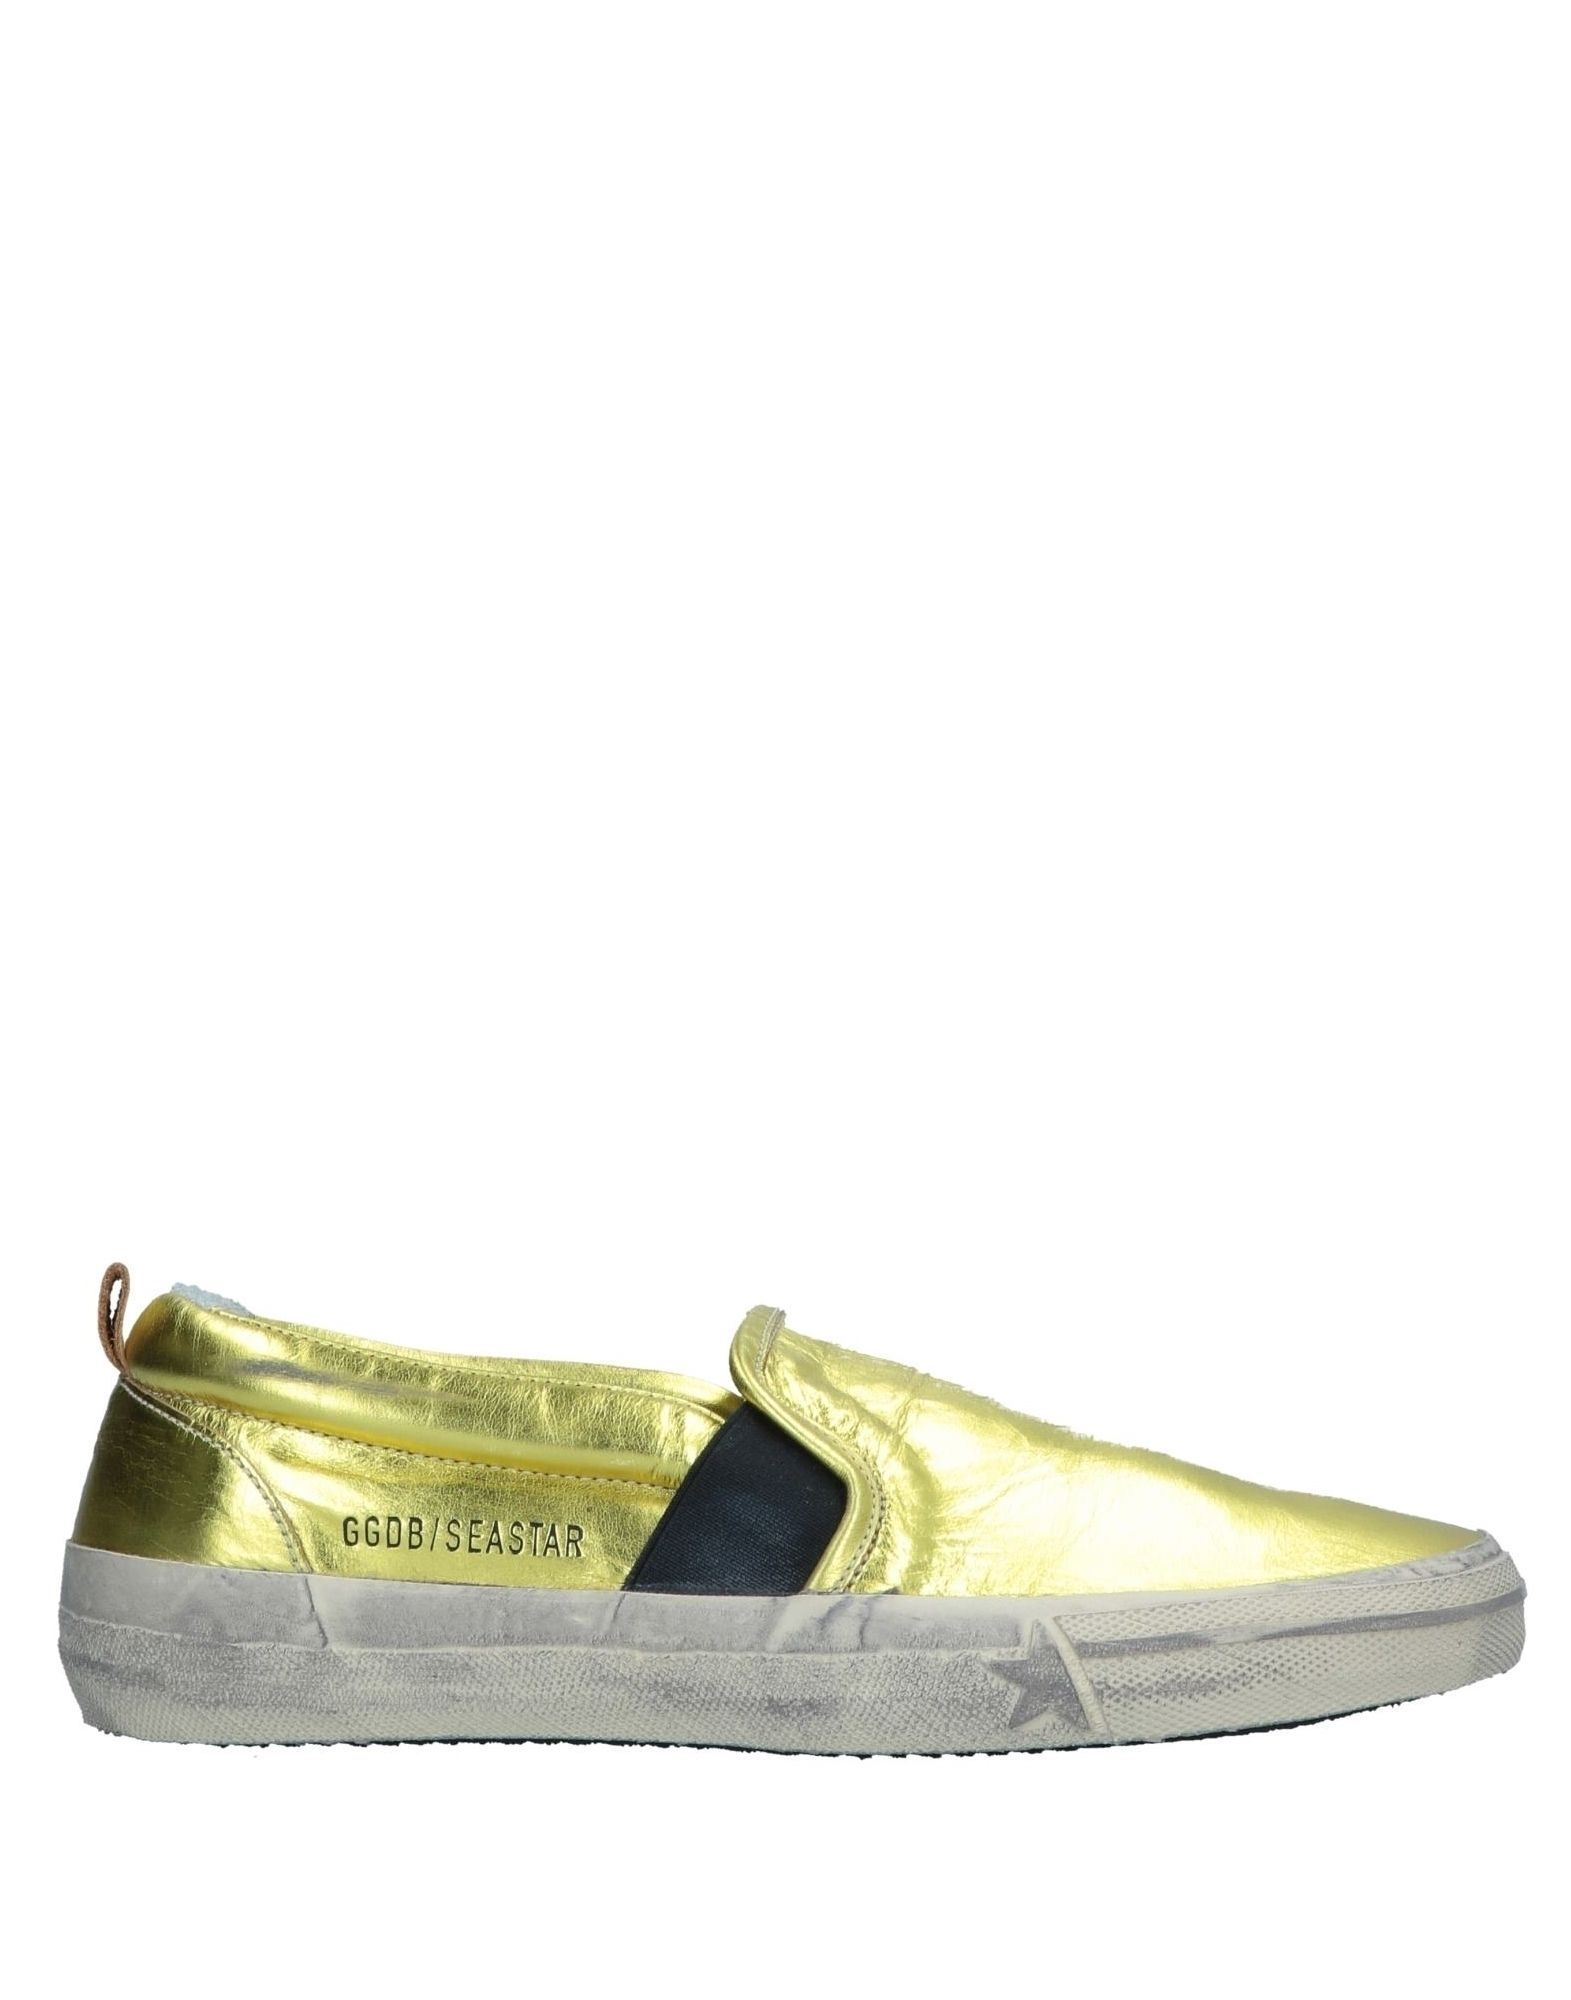 Stilvolle Stilvolle Stilvolle billige Schuhe Golden Goose Deluxe Brand Sneakers Damen  11543288PF 836413